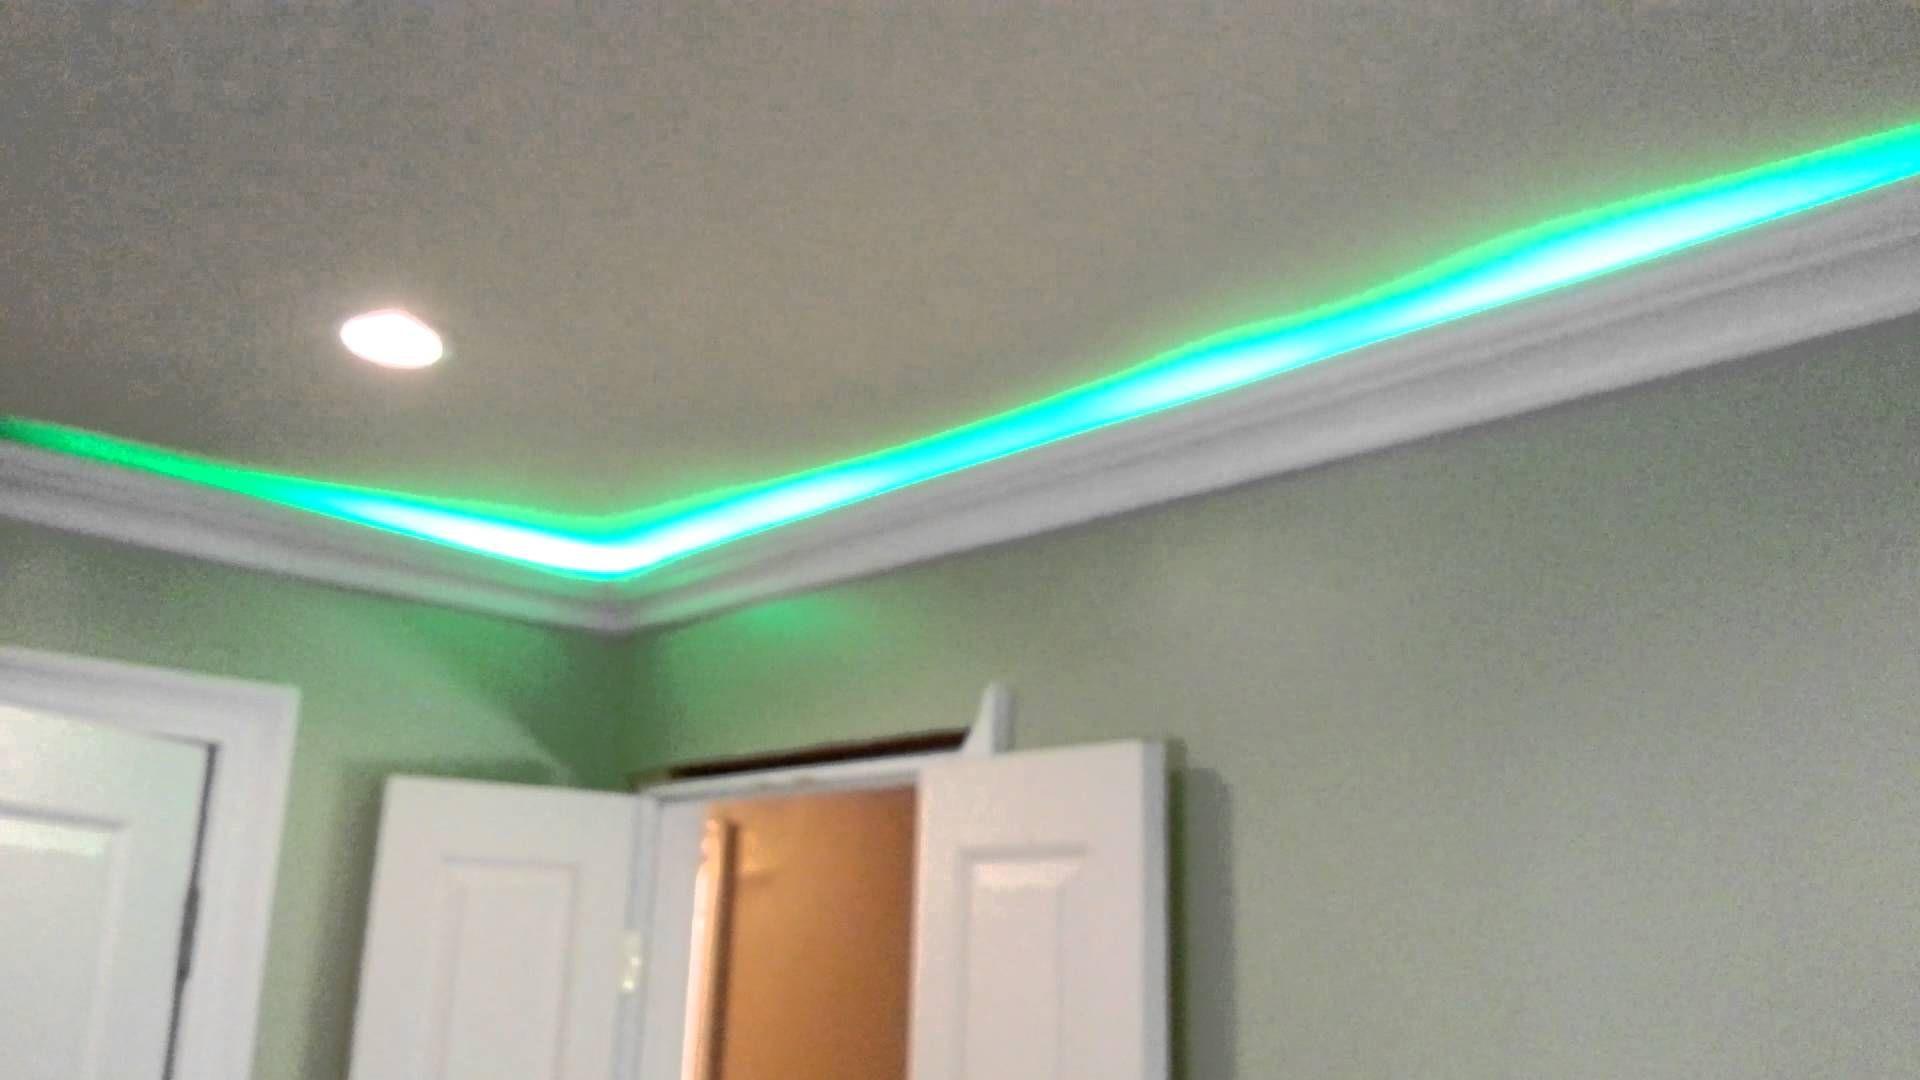 Led Smd Hit Lights Behind Crown Molding Test Fit Bathroom Ceiling Light Crown Molding Installation Molding Installation